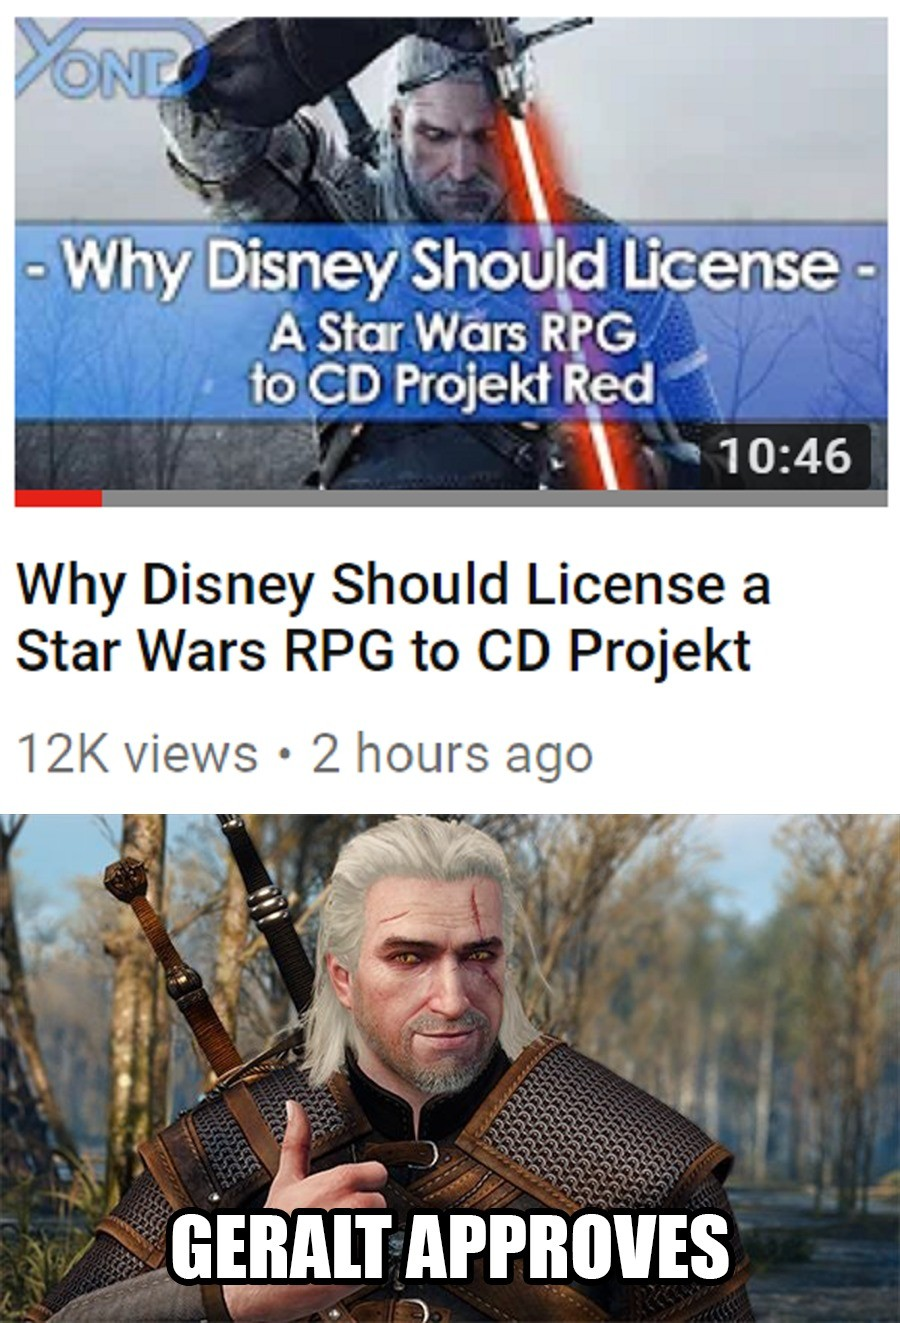 You had my curiosity. join list: VideoGameHumor (1700 subs)Mention Clicks: 567937Msgs Sent: 5351695Mention History. Disney Shot}[ d License - Jlk Star wars RPG